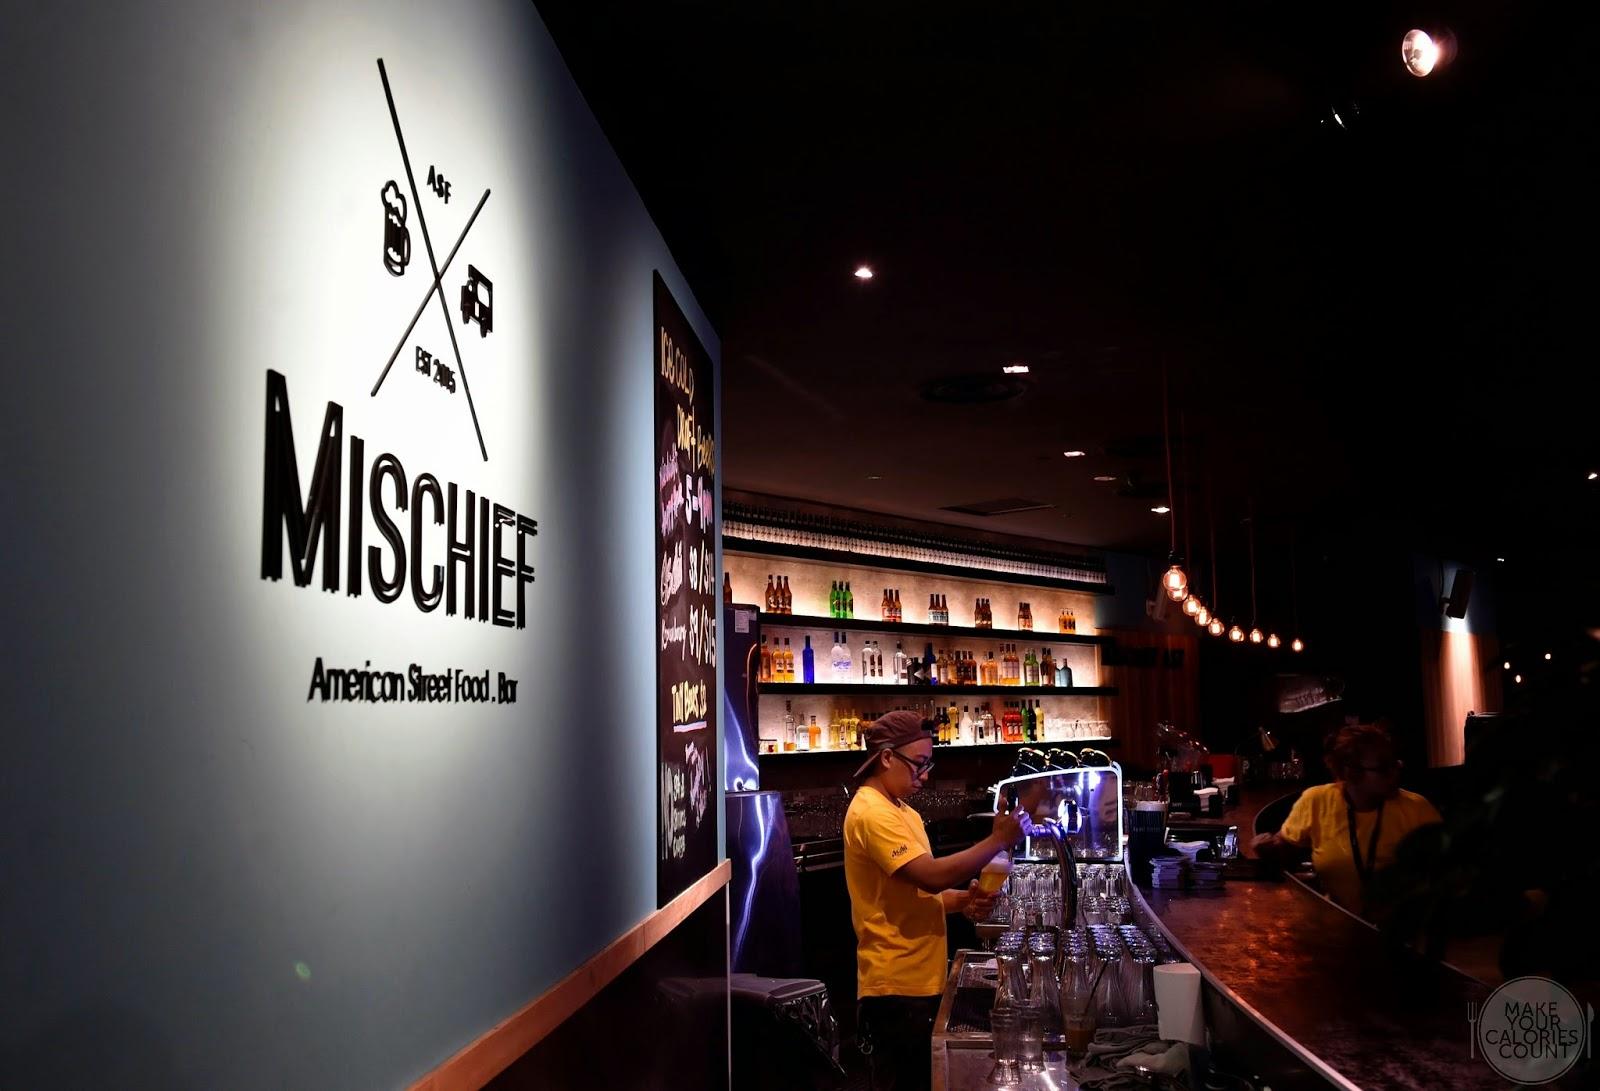 mischief_interior